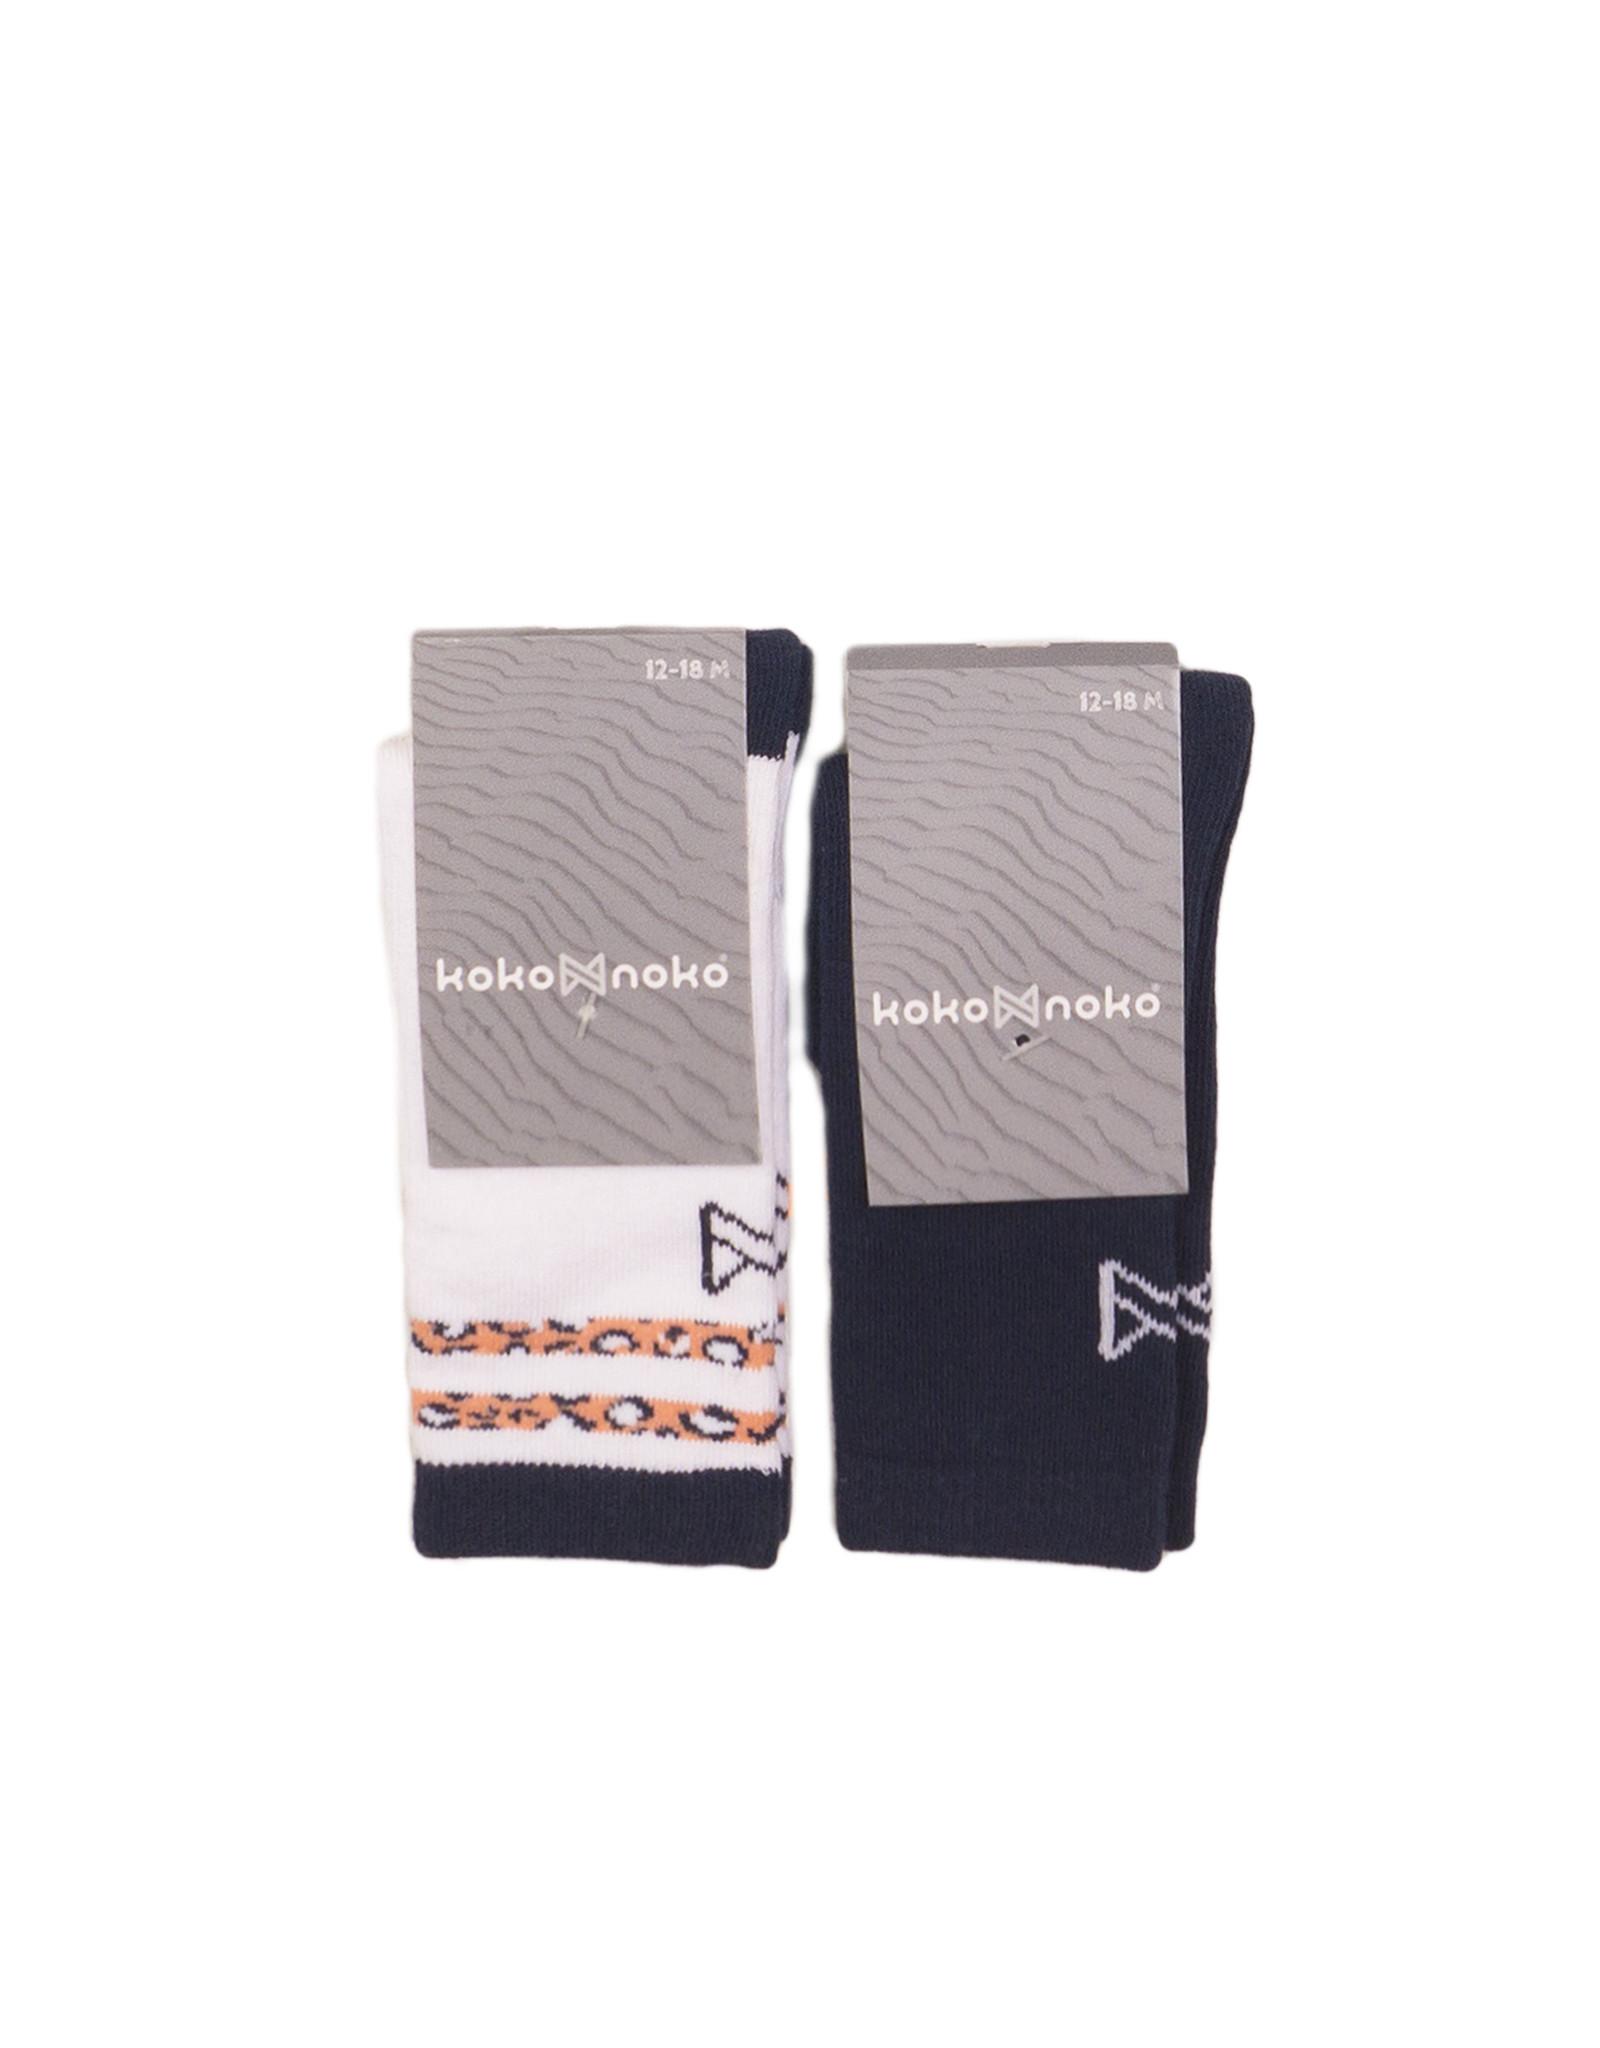 Koko Noko Knee socks 2-pack, Navy + white, SS21